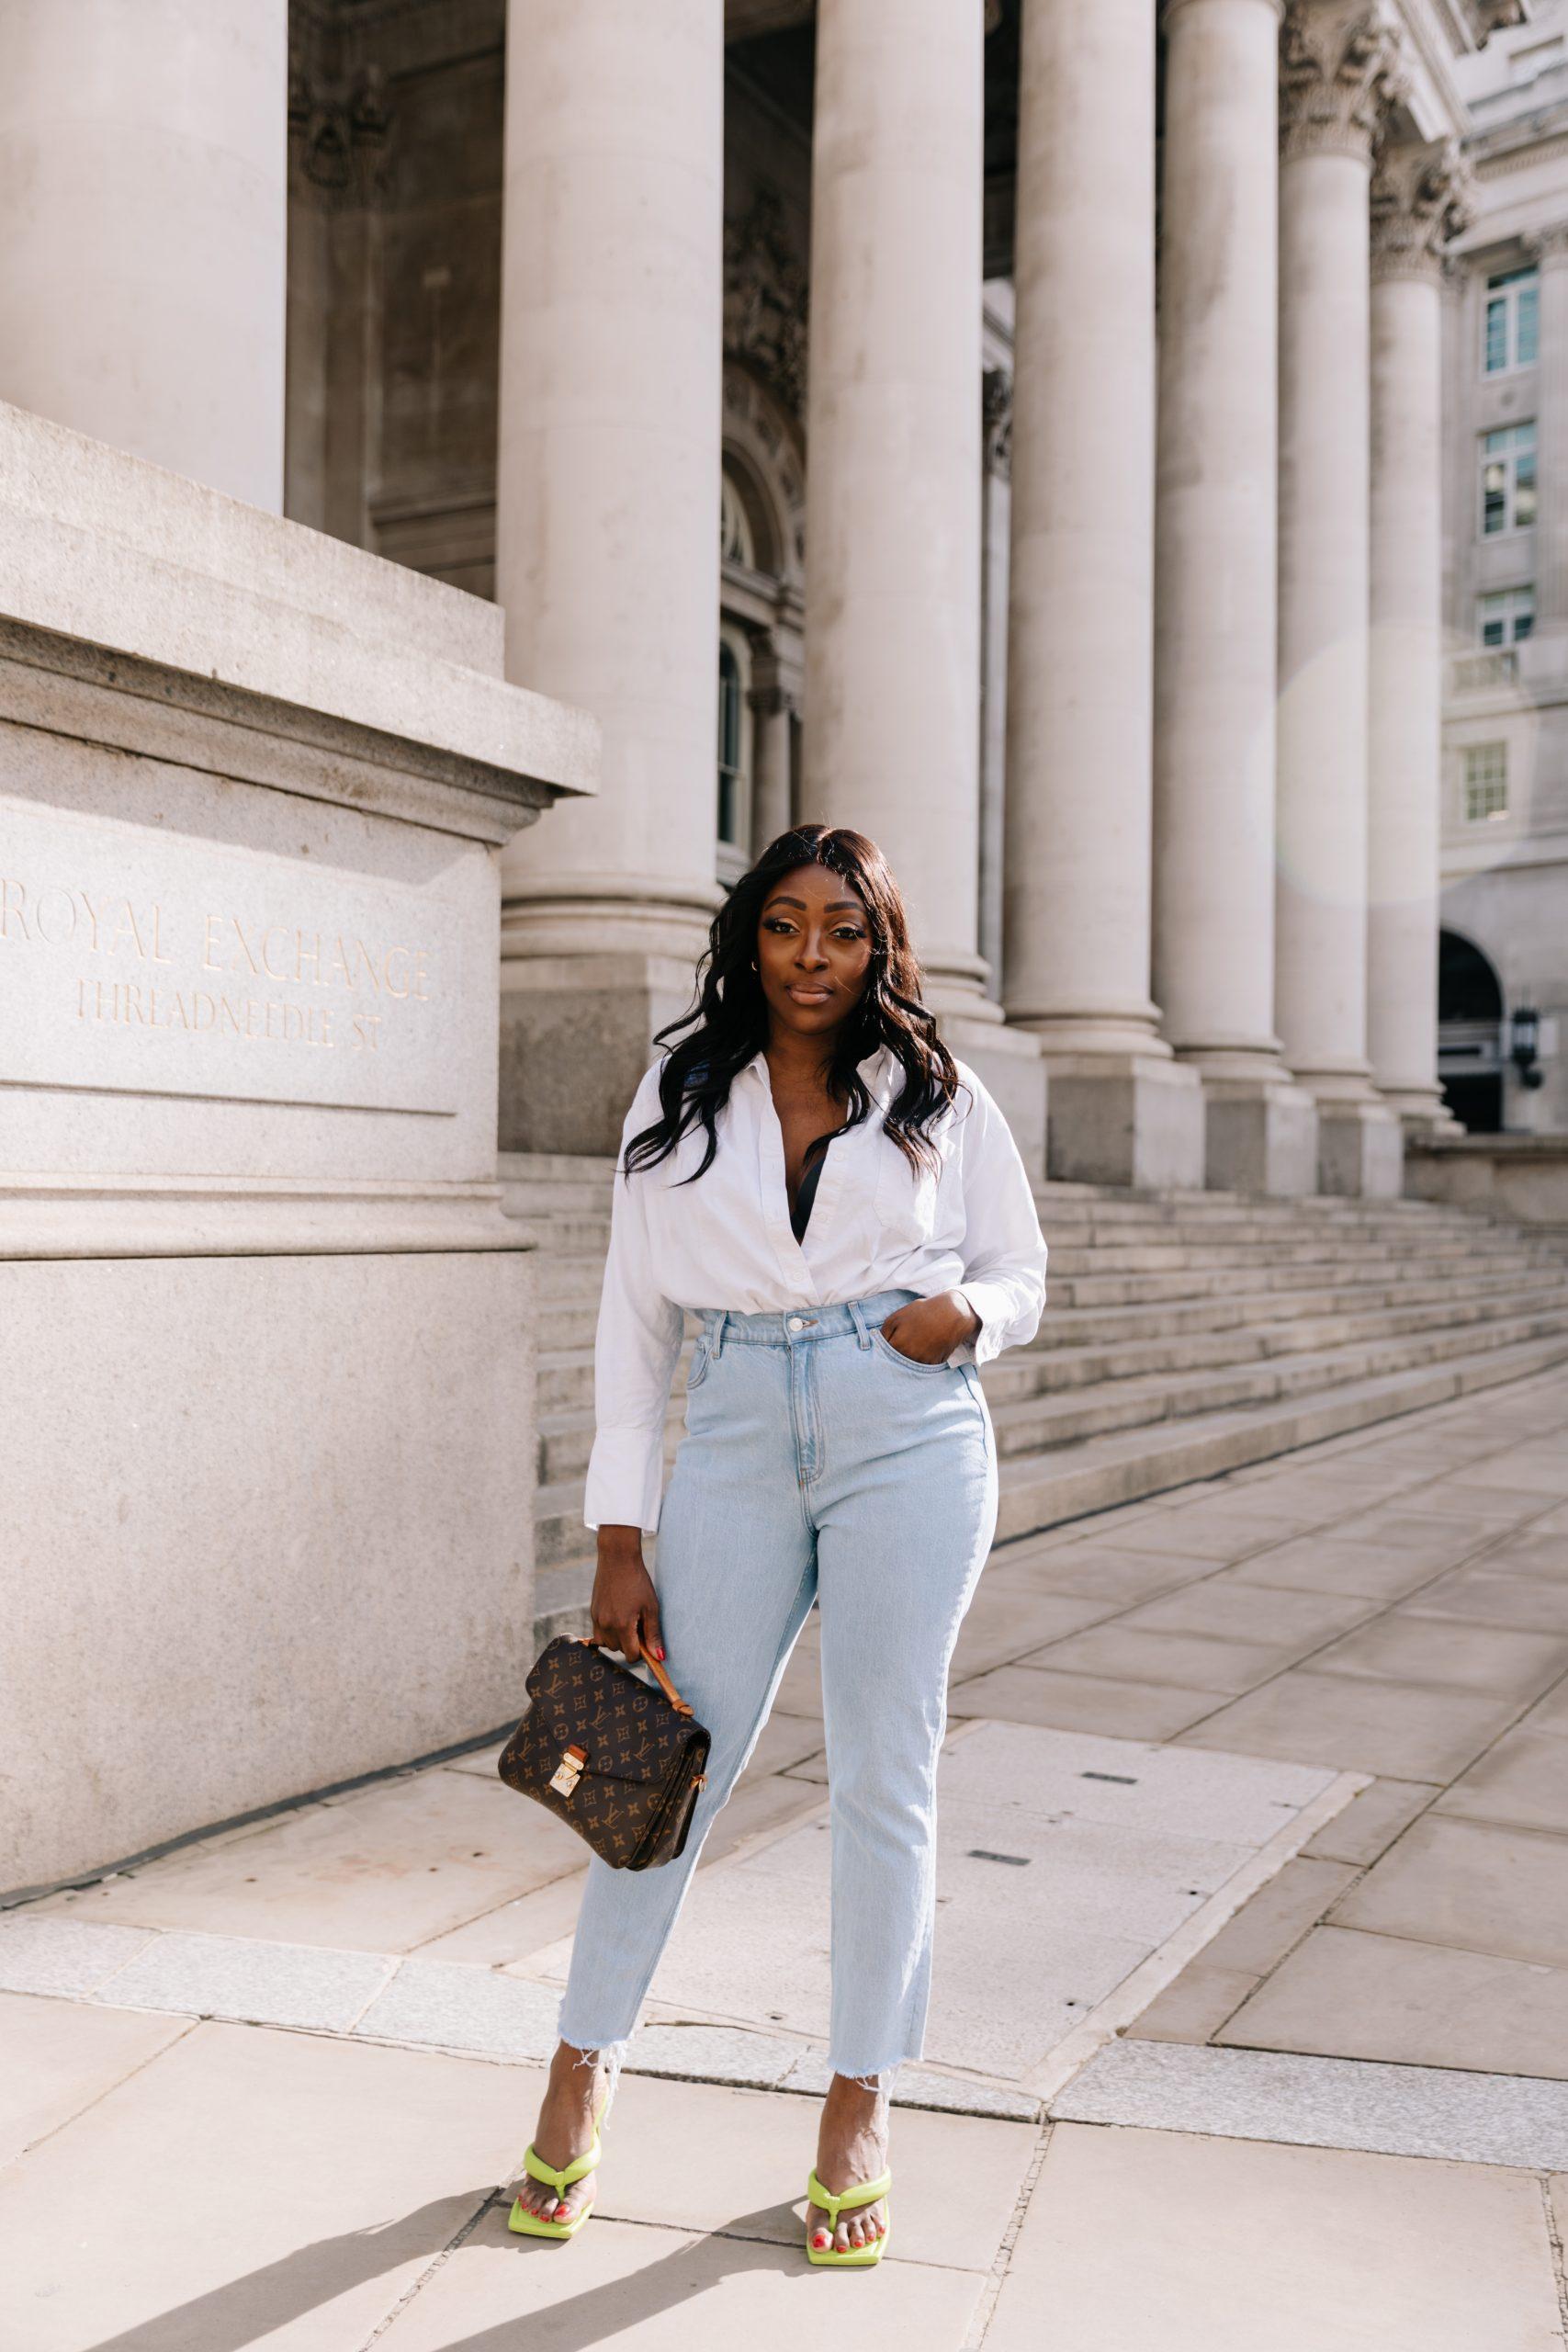 High Waisted Jeans & Denim Trends - high waisted jeans - louis vuitton pochette matis brown- Tasha Antwi